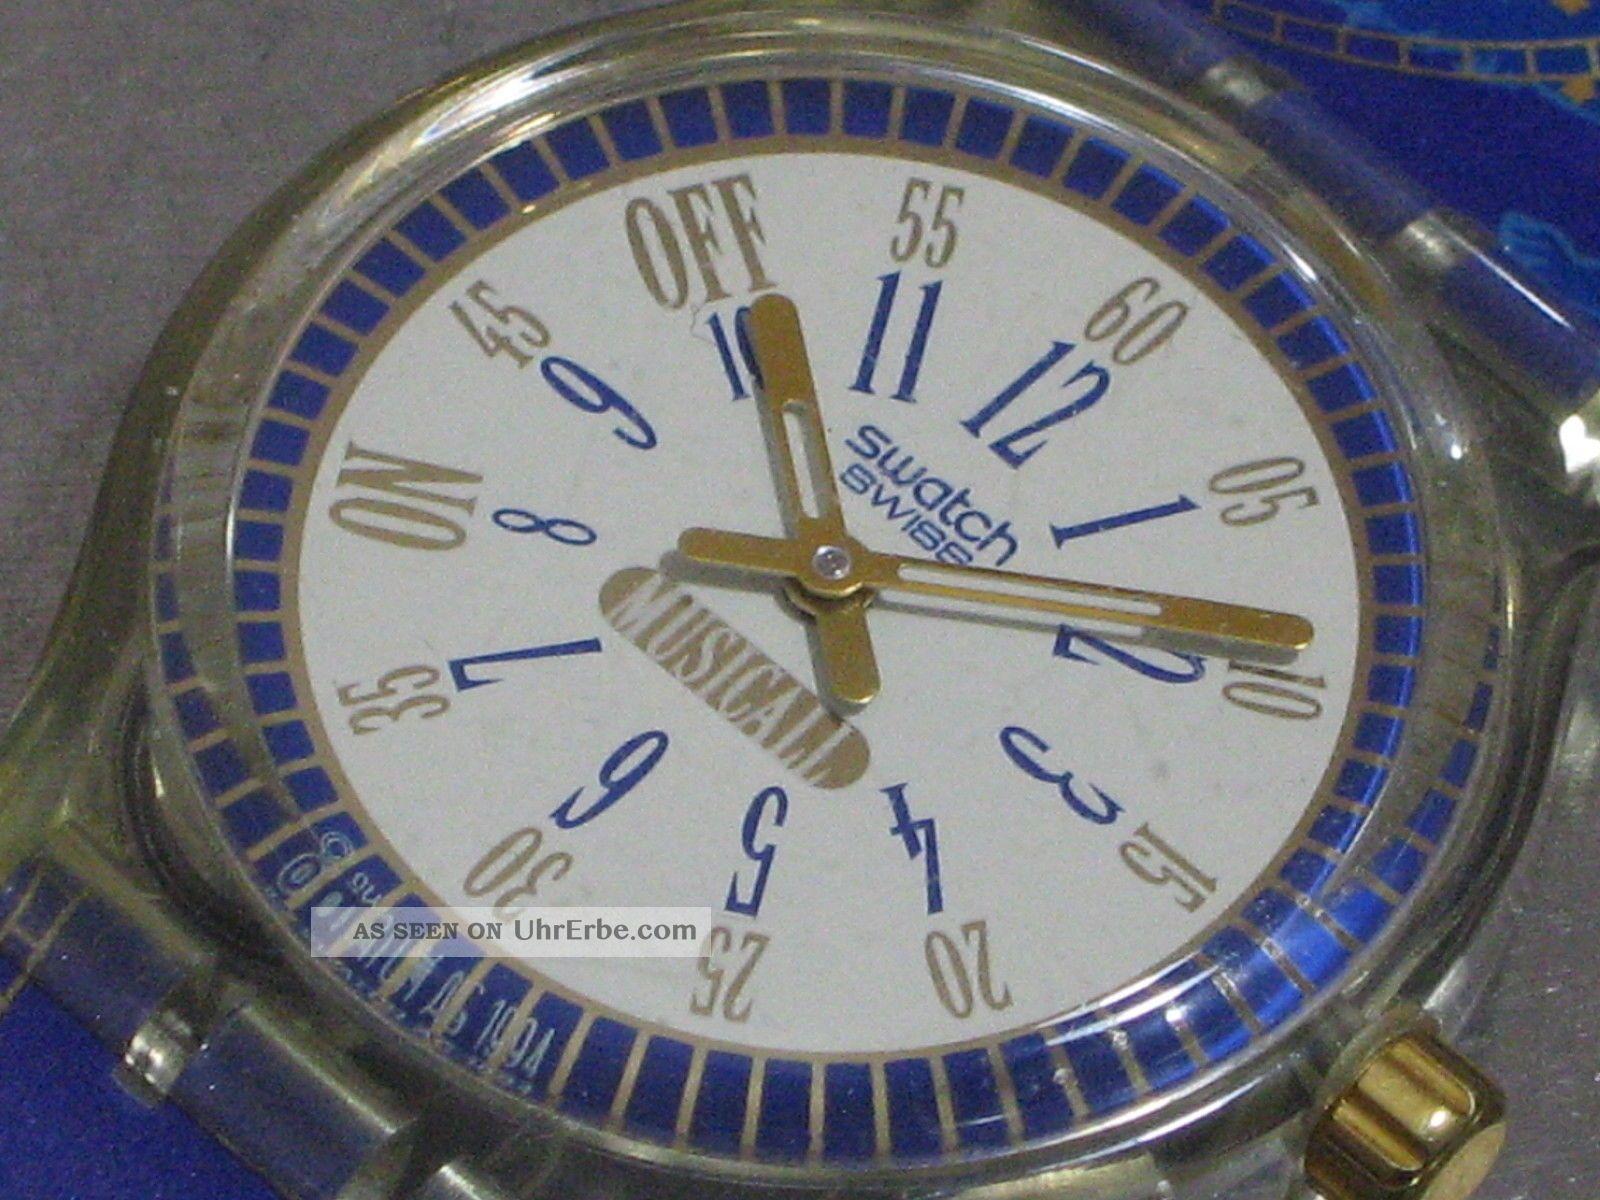 Swatch Musicall Call Up Slk105 Herren - Armbanduhr Alarm Batt.  Ovp Top Armbanduhren Bild